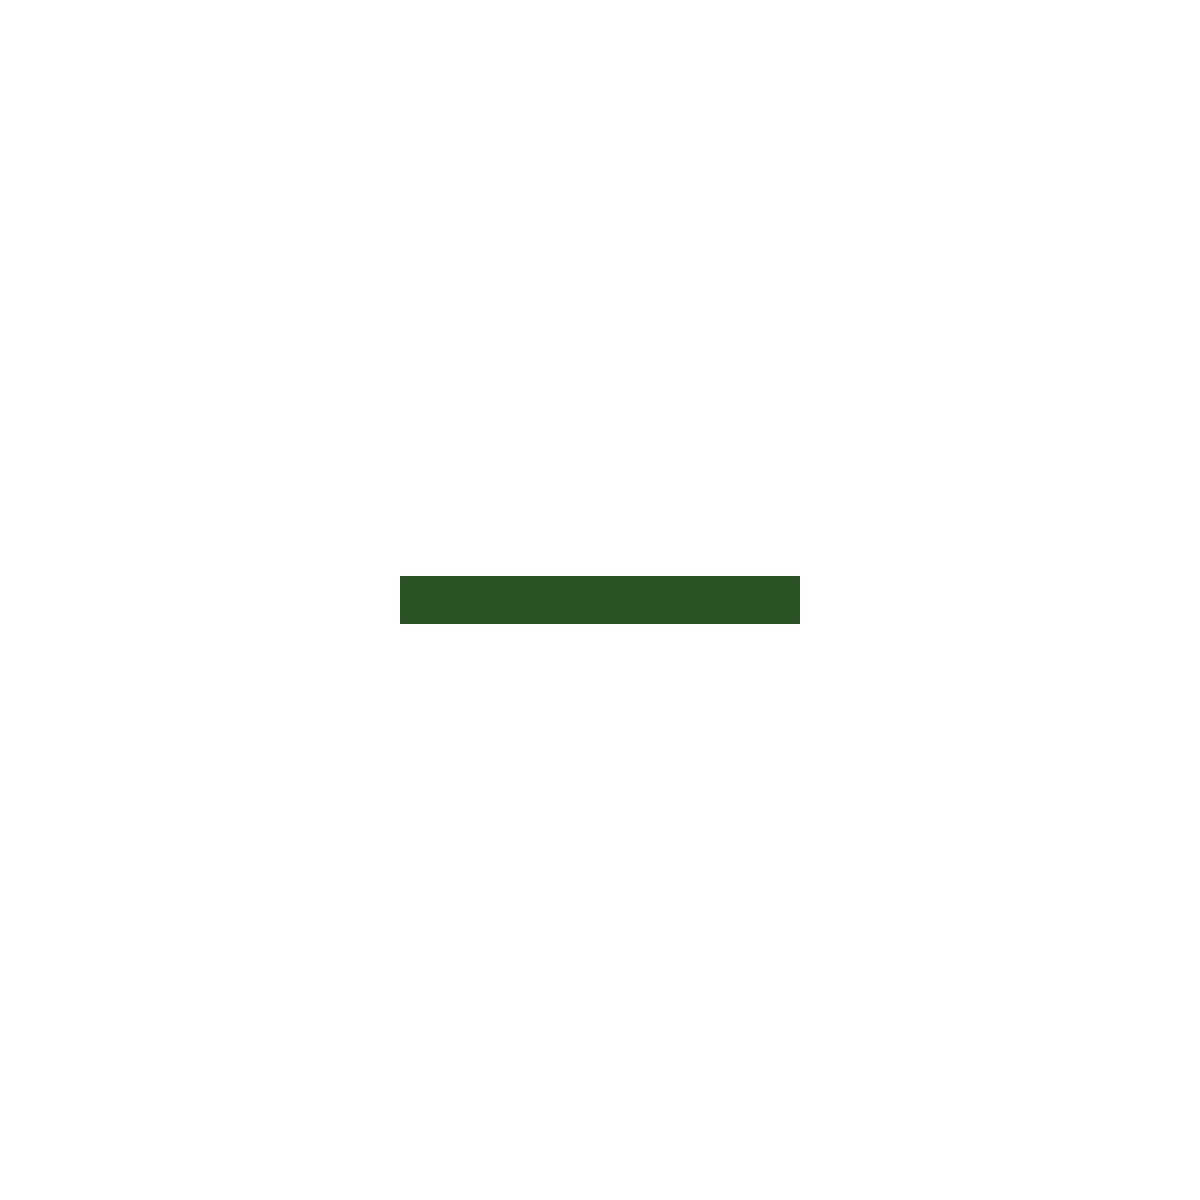 Tira relieve verde 3x28 (ud)